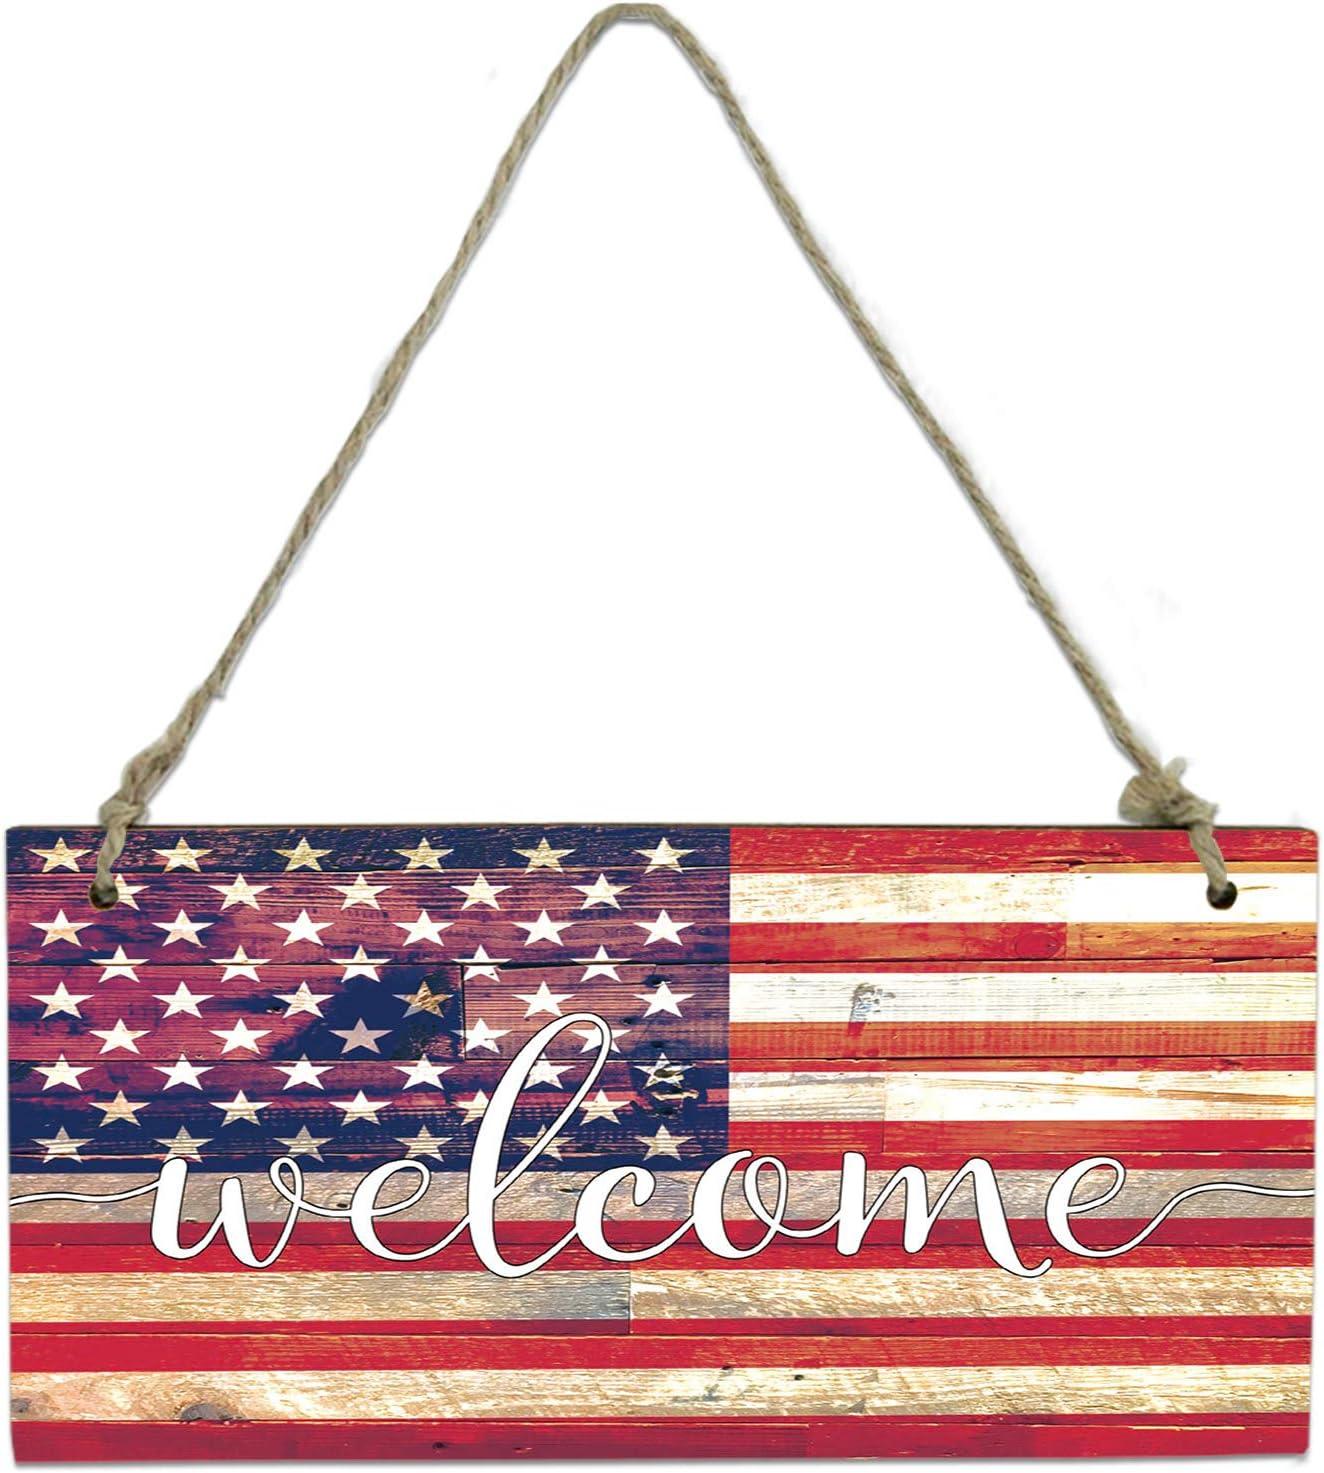 Futuregrace Retro Style American Flag Stripe Print Welcome Welcome Sign Rectangle Wooden Hanging Door Sign,Front Wall Art Door Hangers Decorations for Restaurant,Home,Outdoor,8x4in